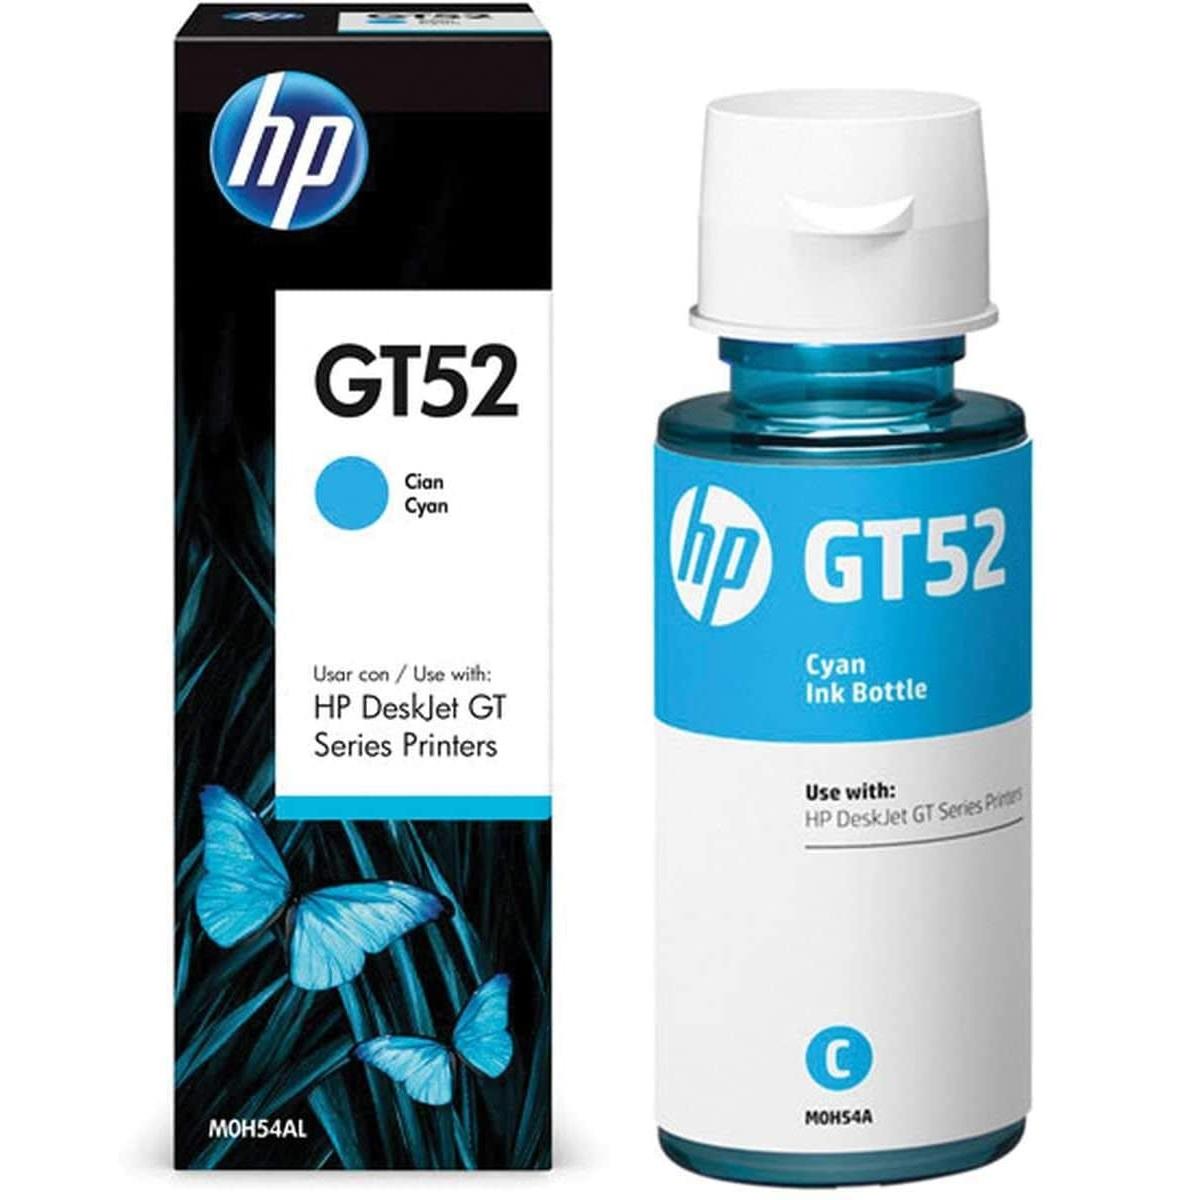 GT52-M0H54AL